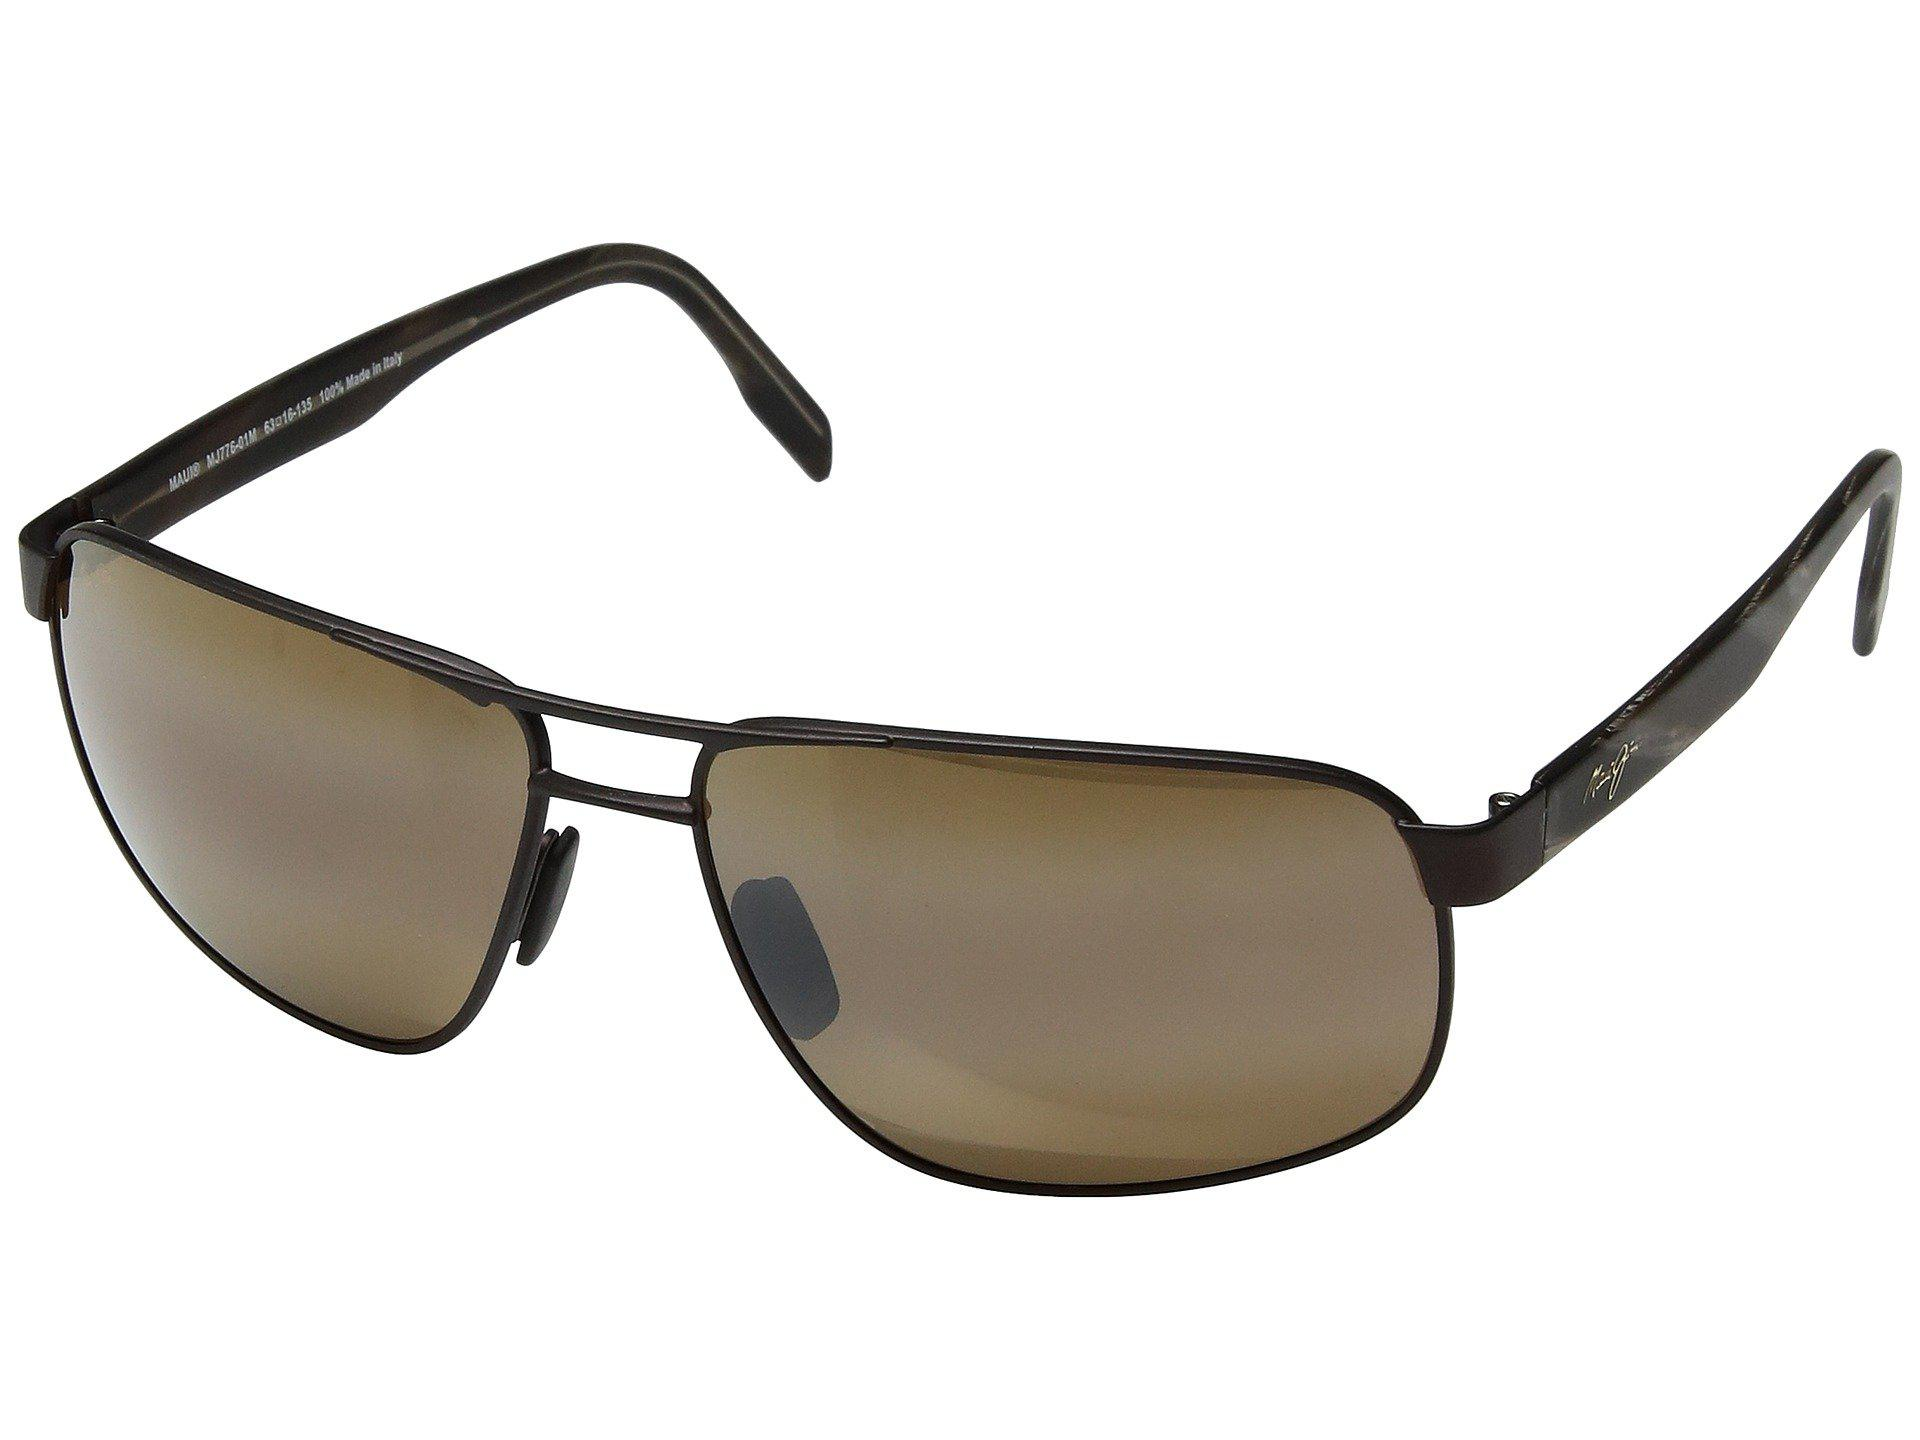 Maui Jim Naupaka Sonnenbrille Satin Schokolade 01M Polarisiert 53mm SmQ6rr2